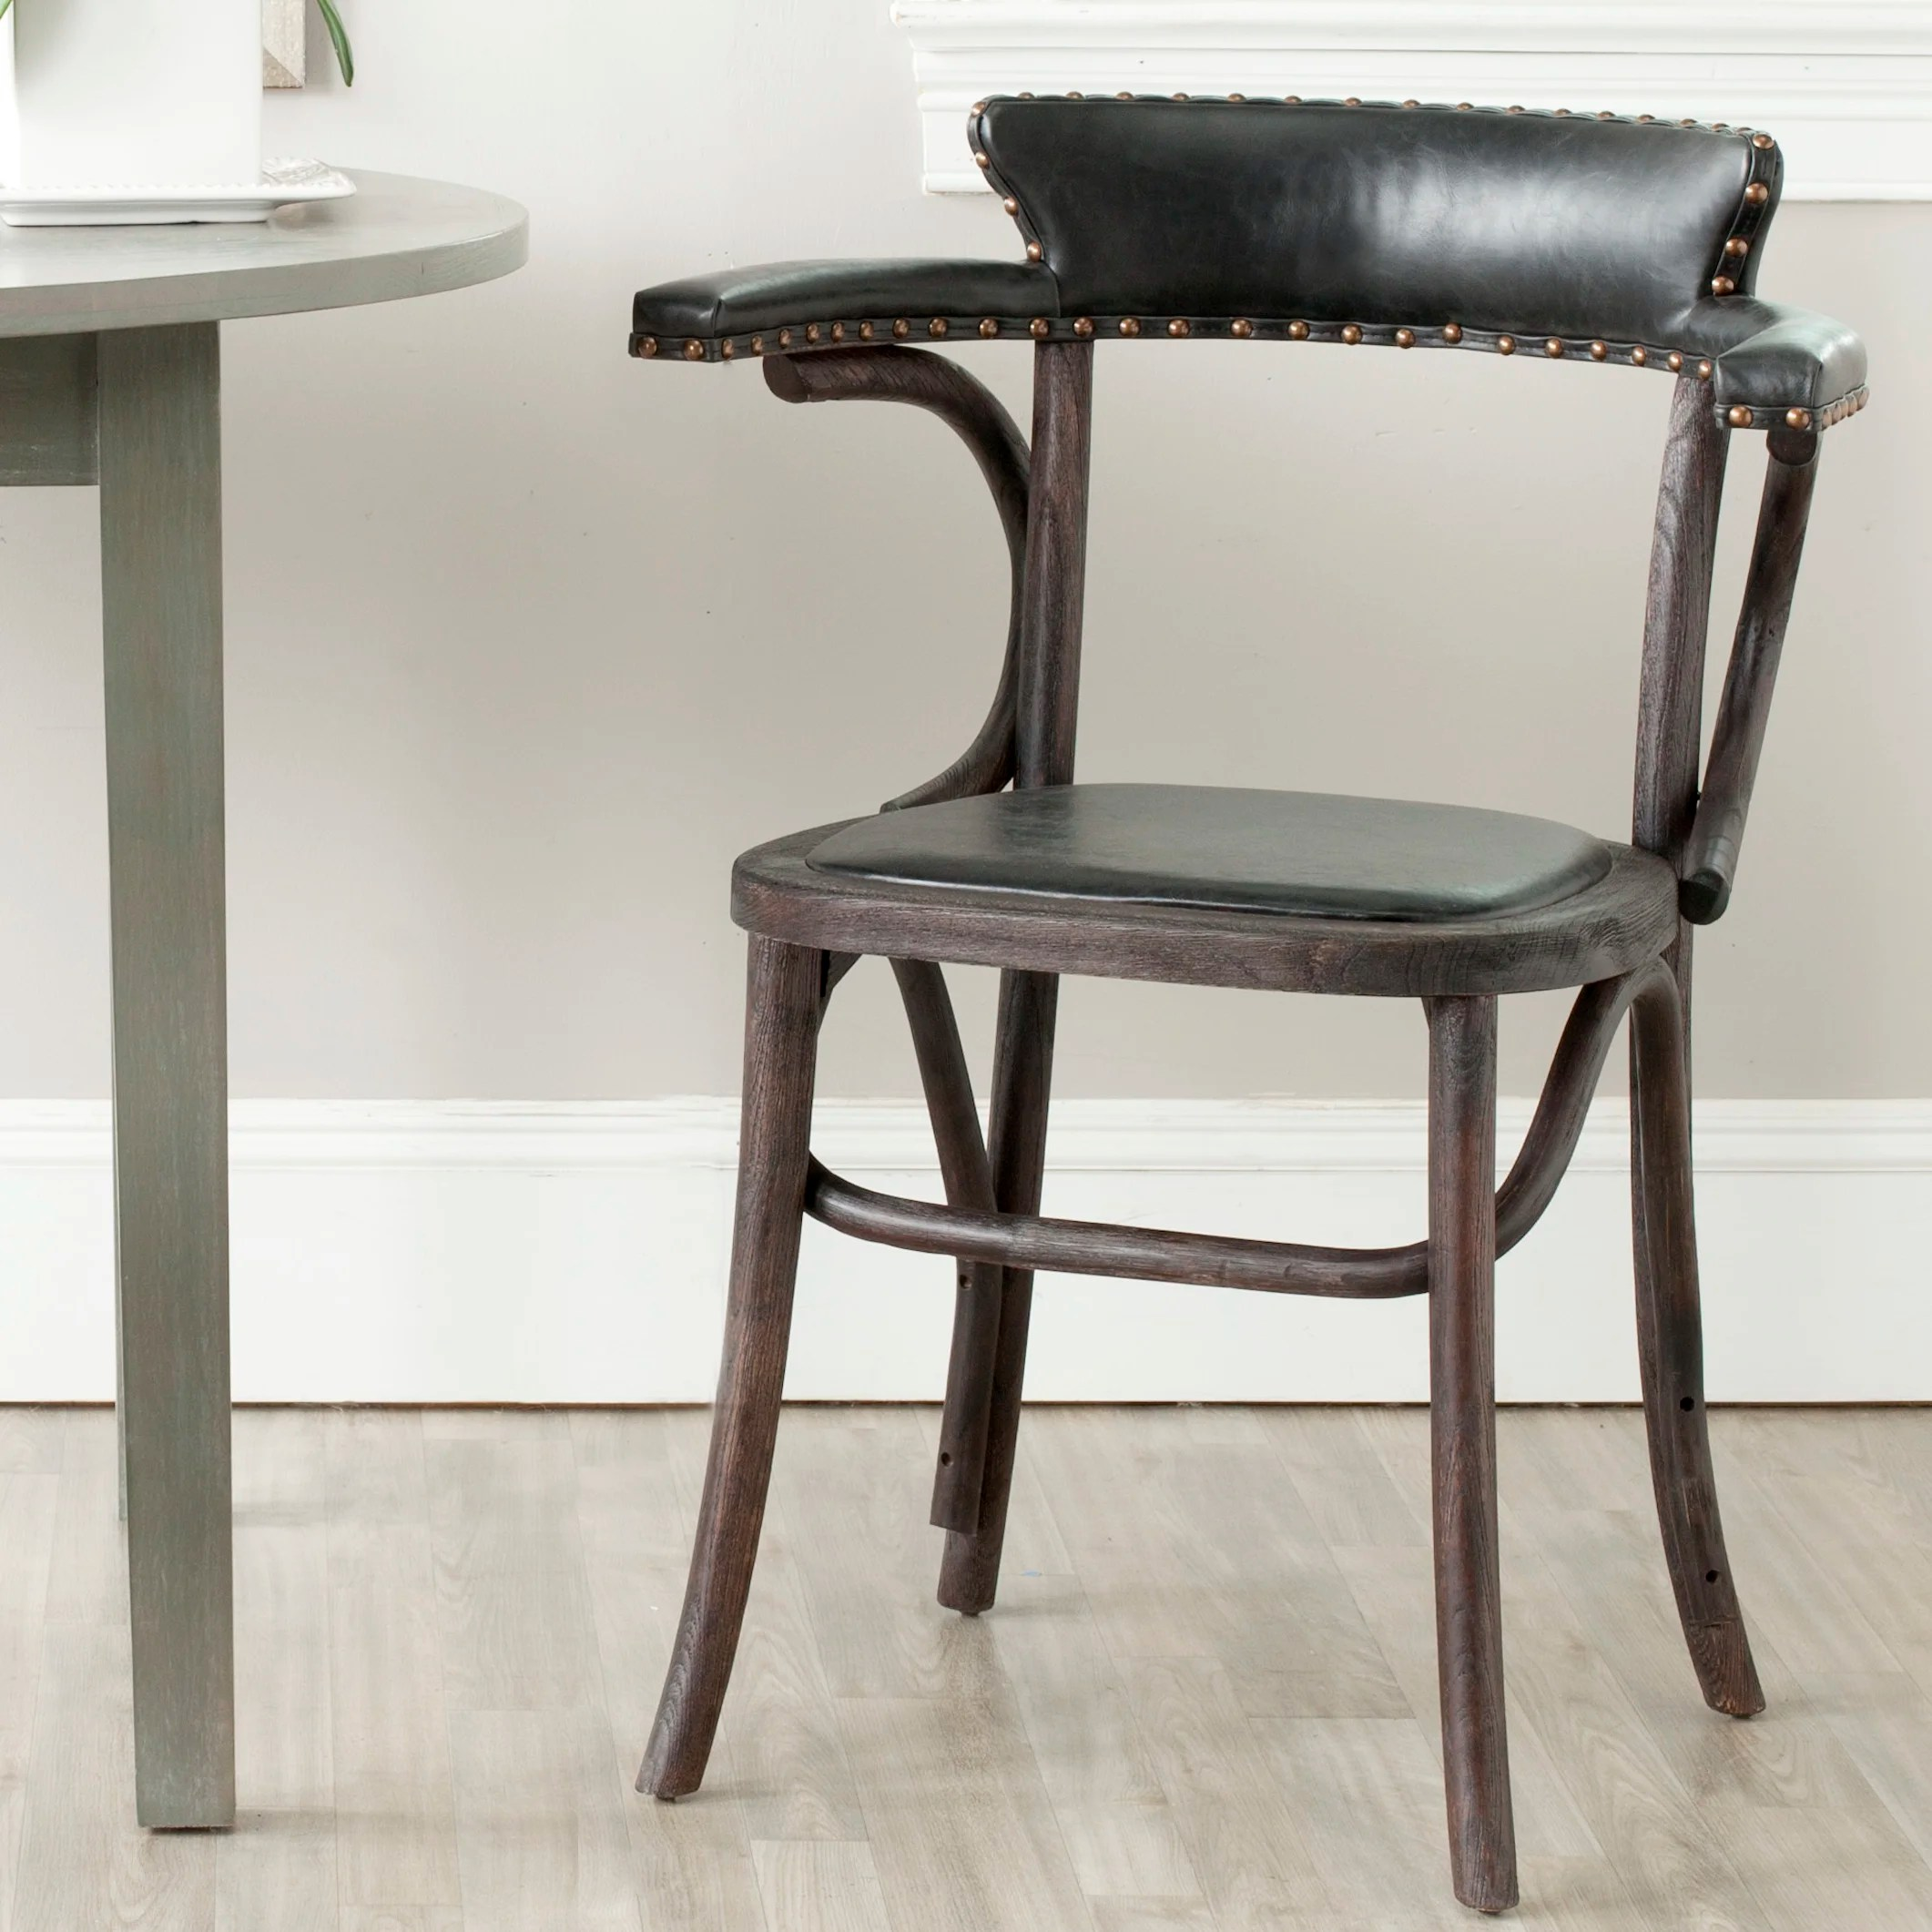 safavieh dining chairs red chair and ottoman salma wayfair uk